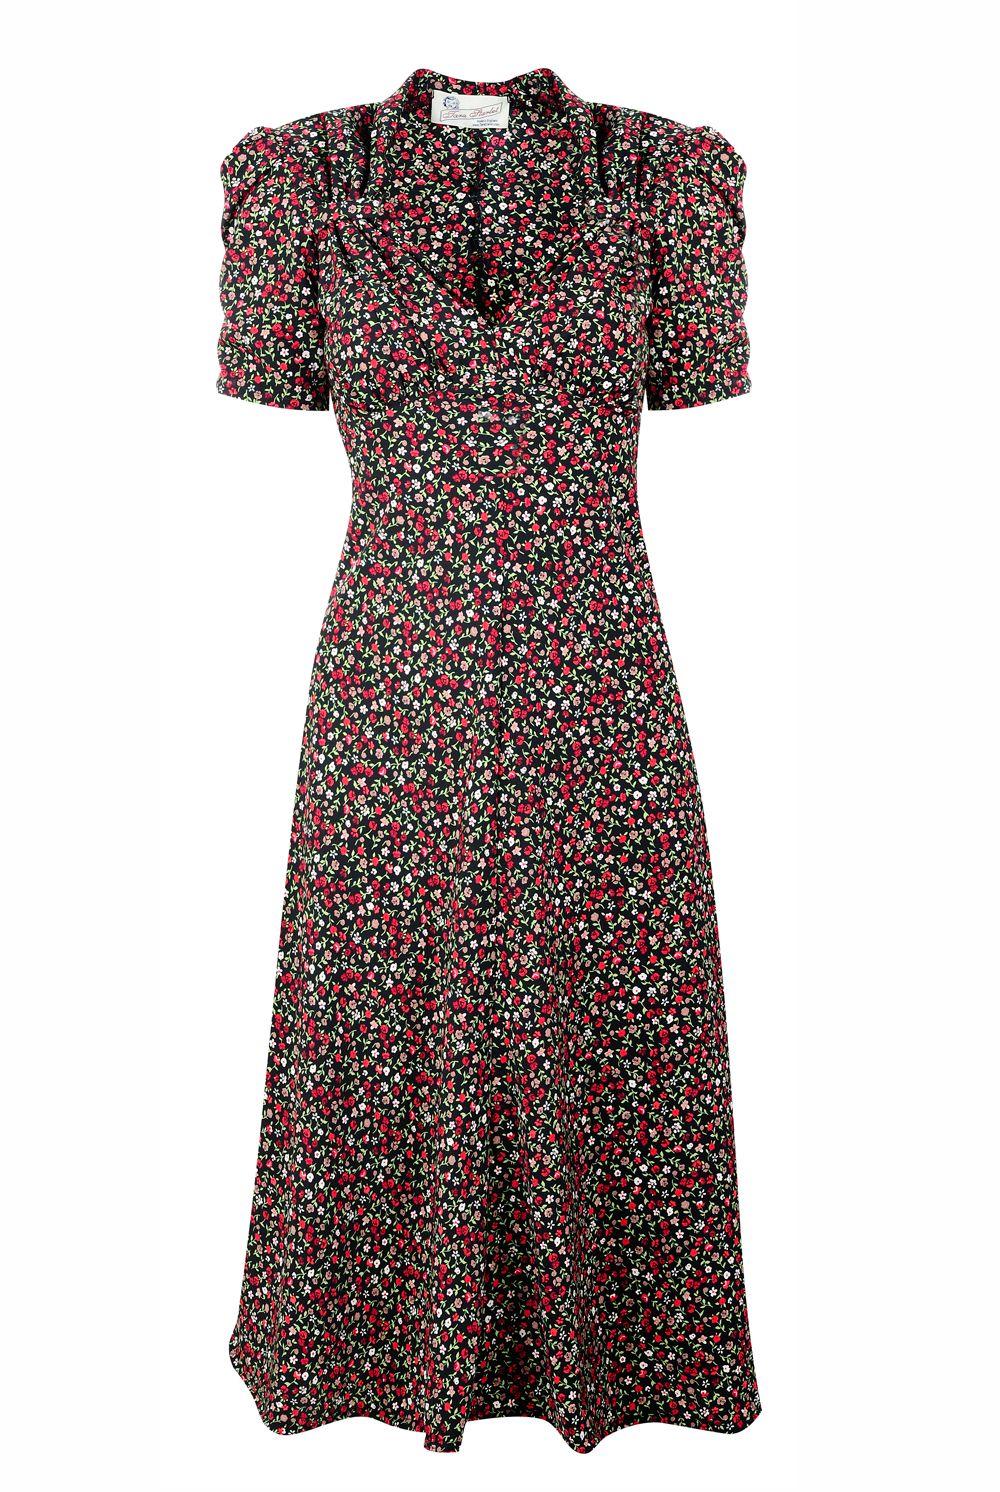 Tara Starlet 1940s 40s Style: Floral Sweetheart Dress